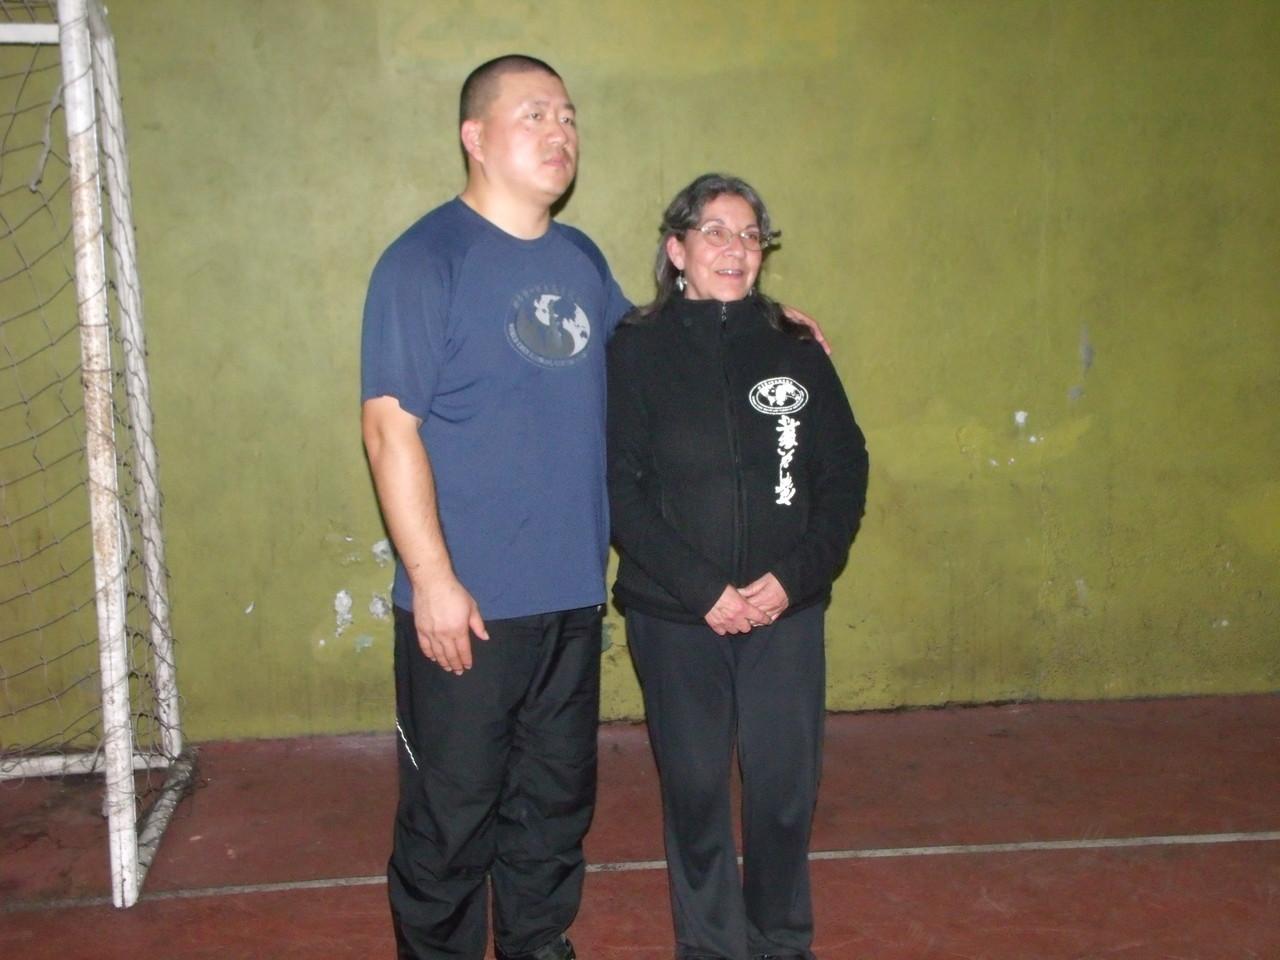 Master Chen YingJun y Verna Alvarado (Instructora Cxwta-Chile)